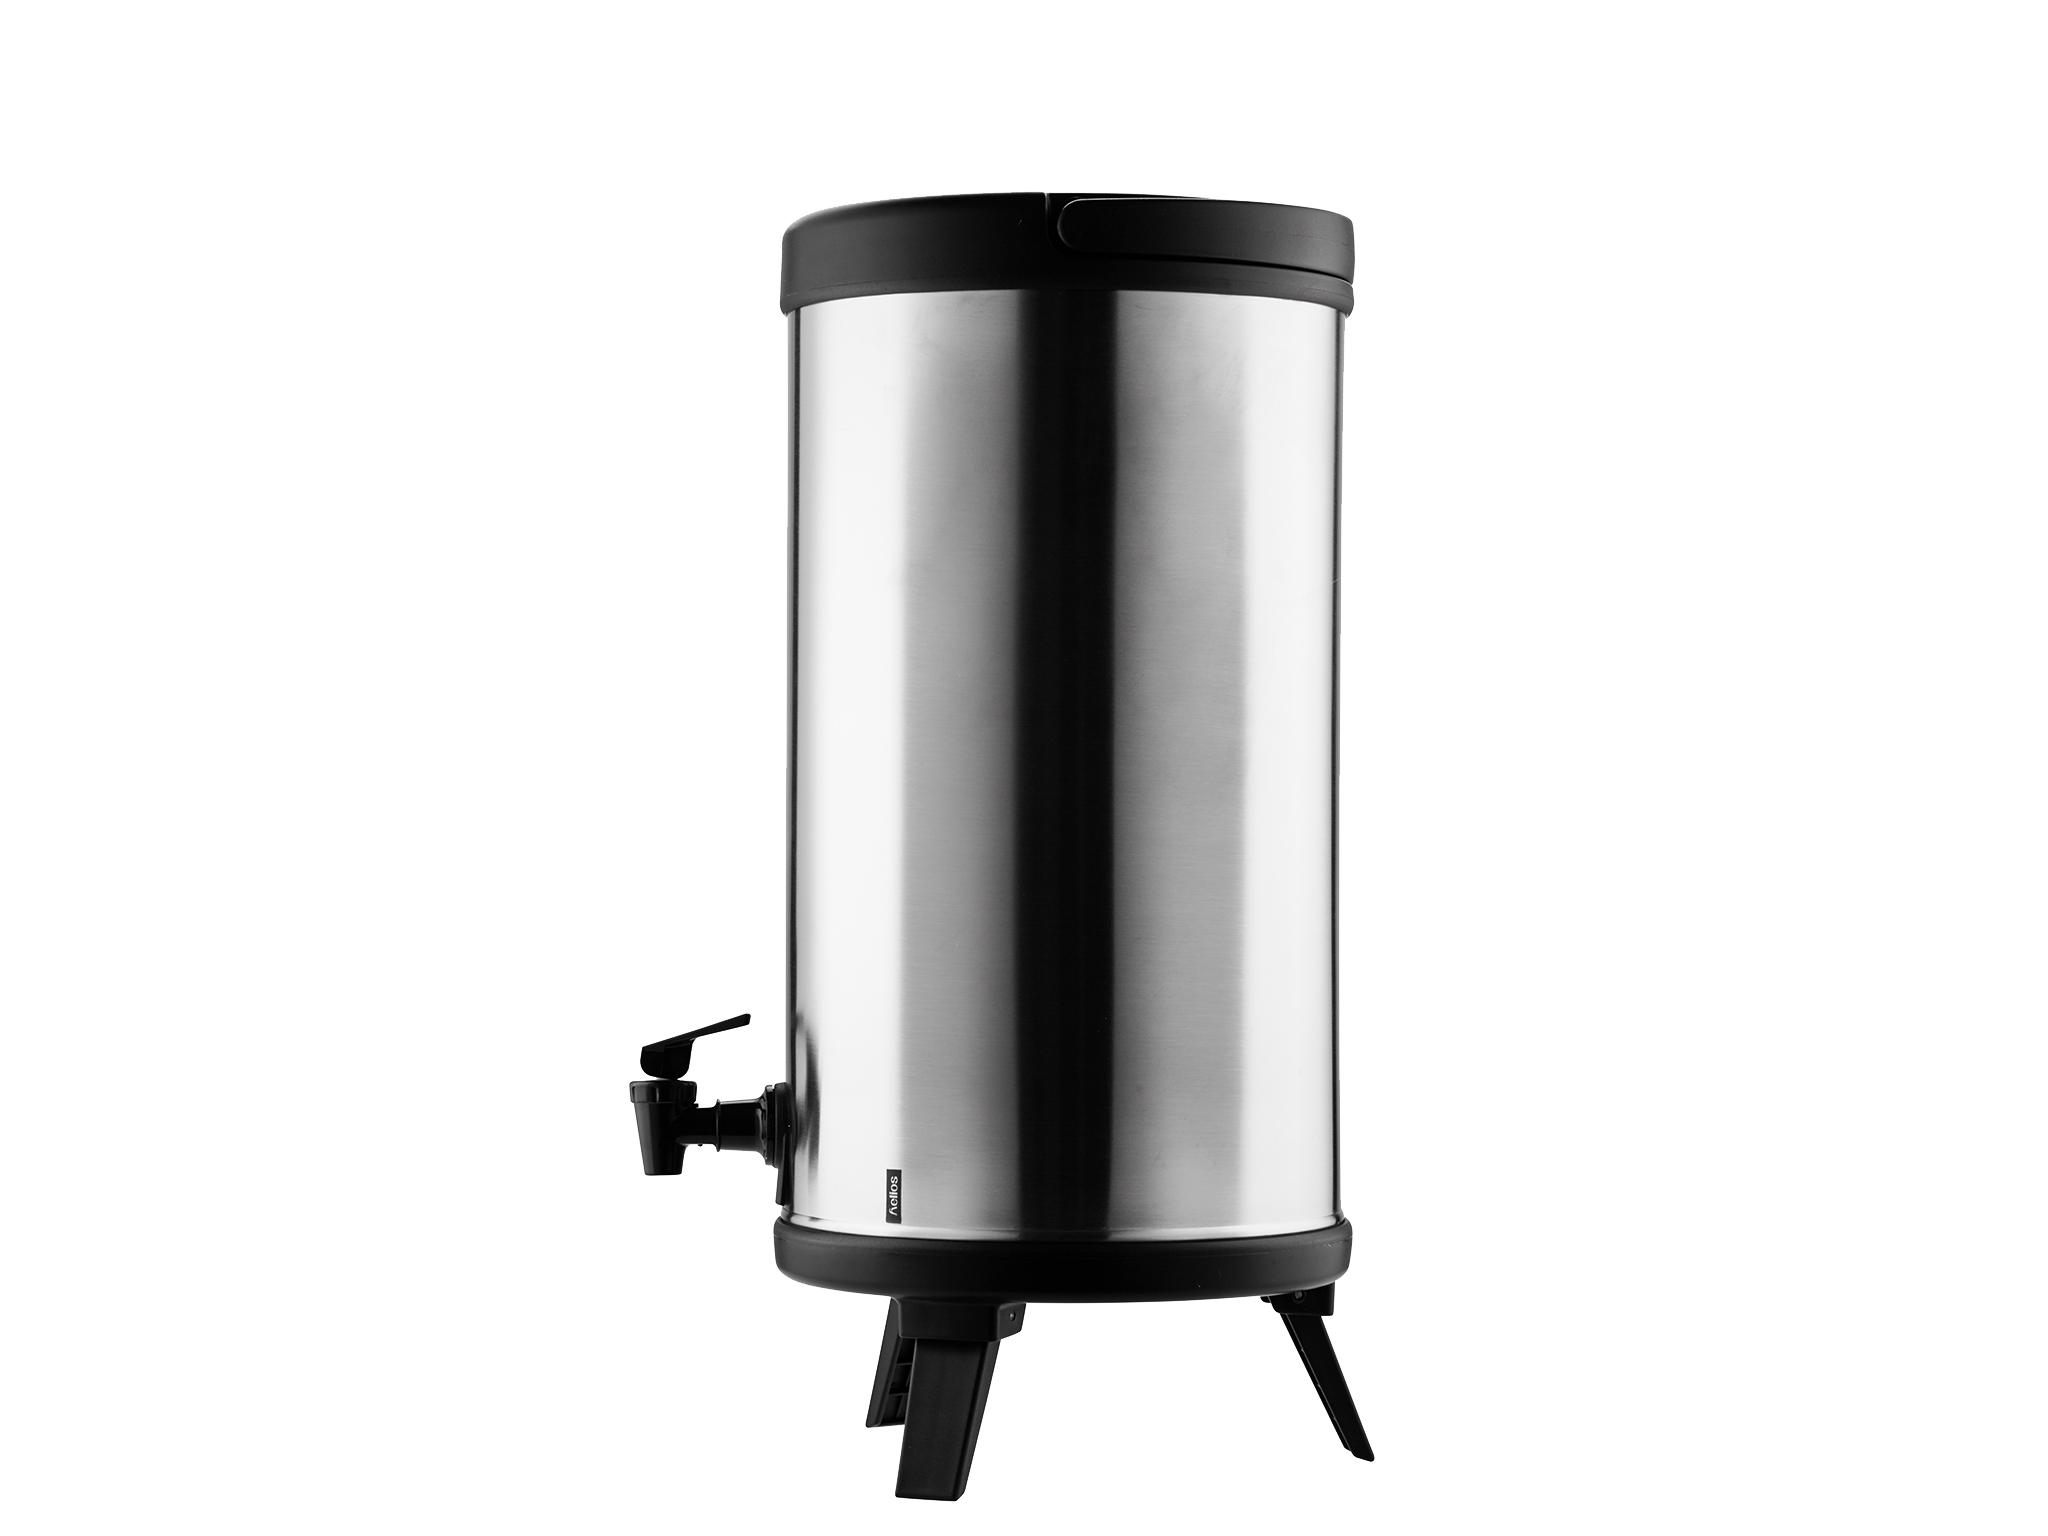 8300 - Vacuum tank SS with tap 10.0 L MAXX - Helios